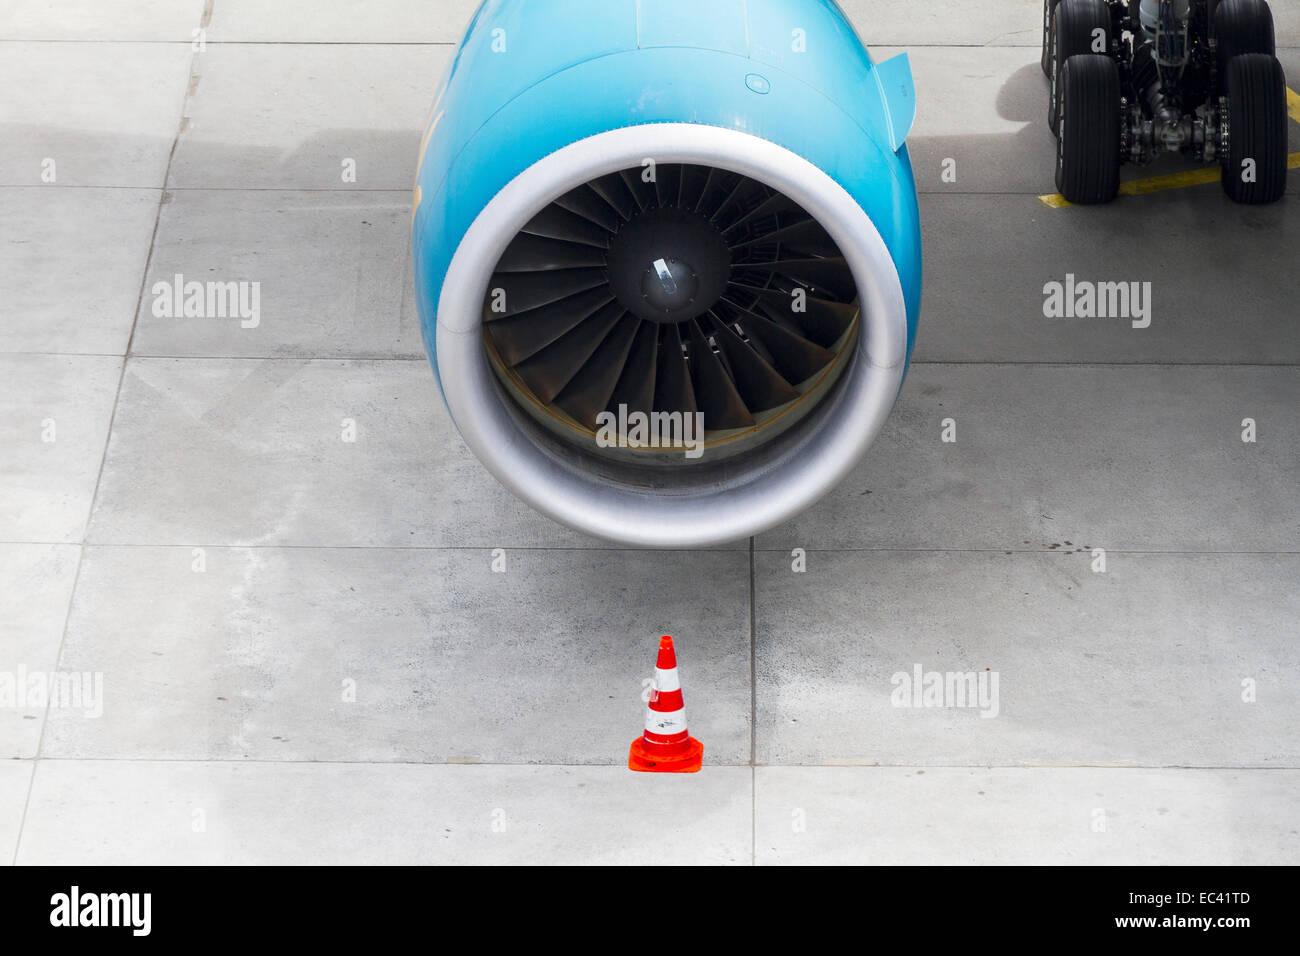 Turbine of a jet plane - Stock Image